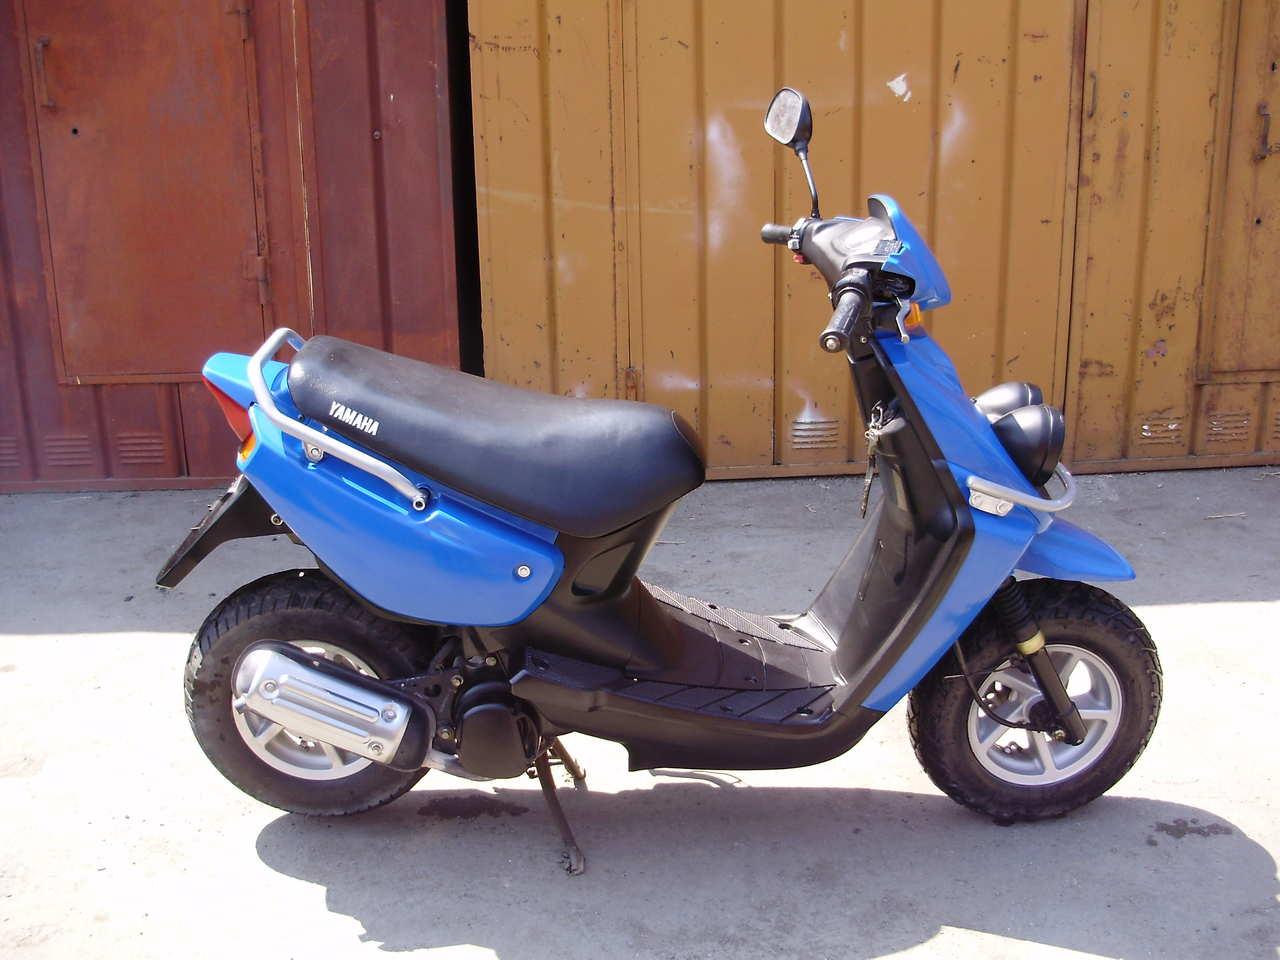 Used 2000 yamaha bws photos 100cc for sale for Yamaha bws 100 for sale